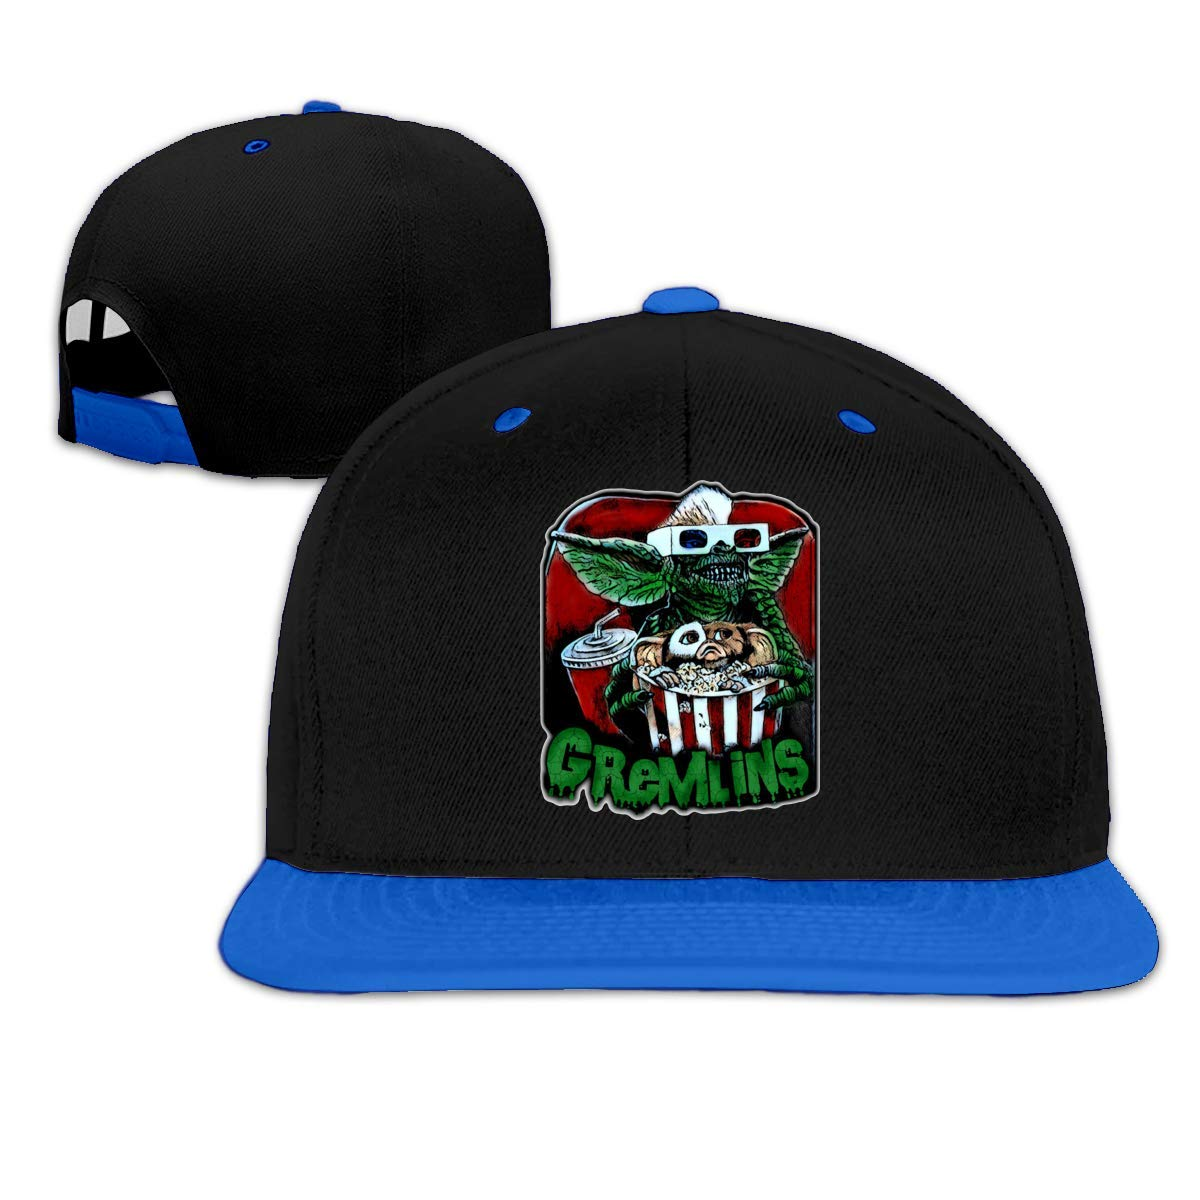 Gremlins Summer Cool Heat Shield Unisex Hip Hop Baseball Cap